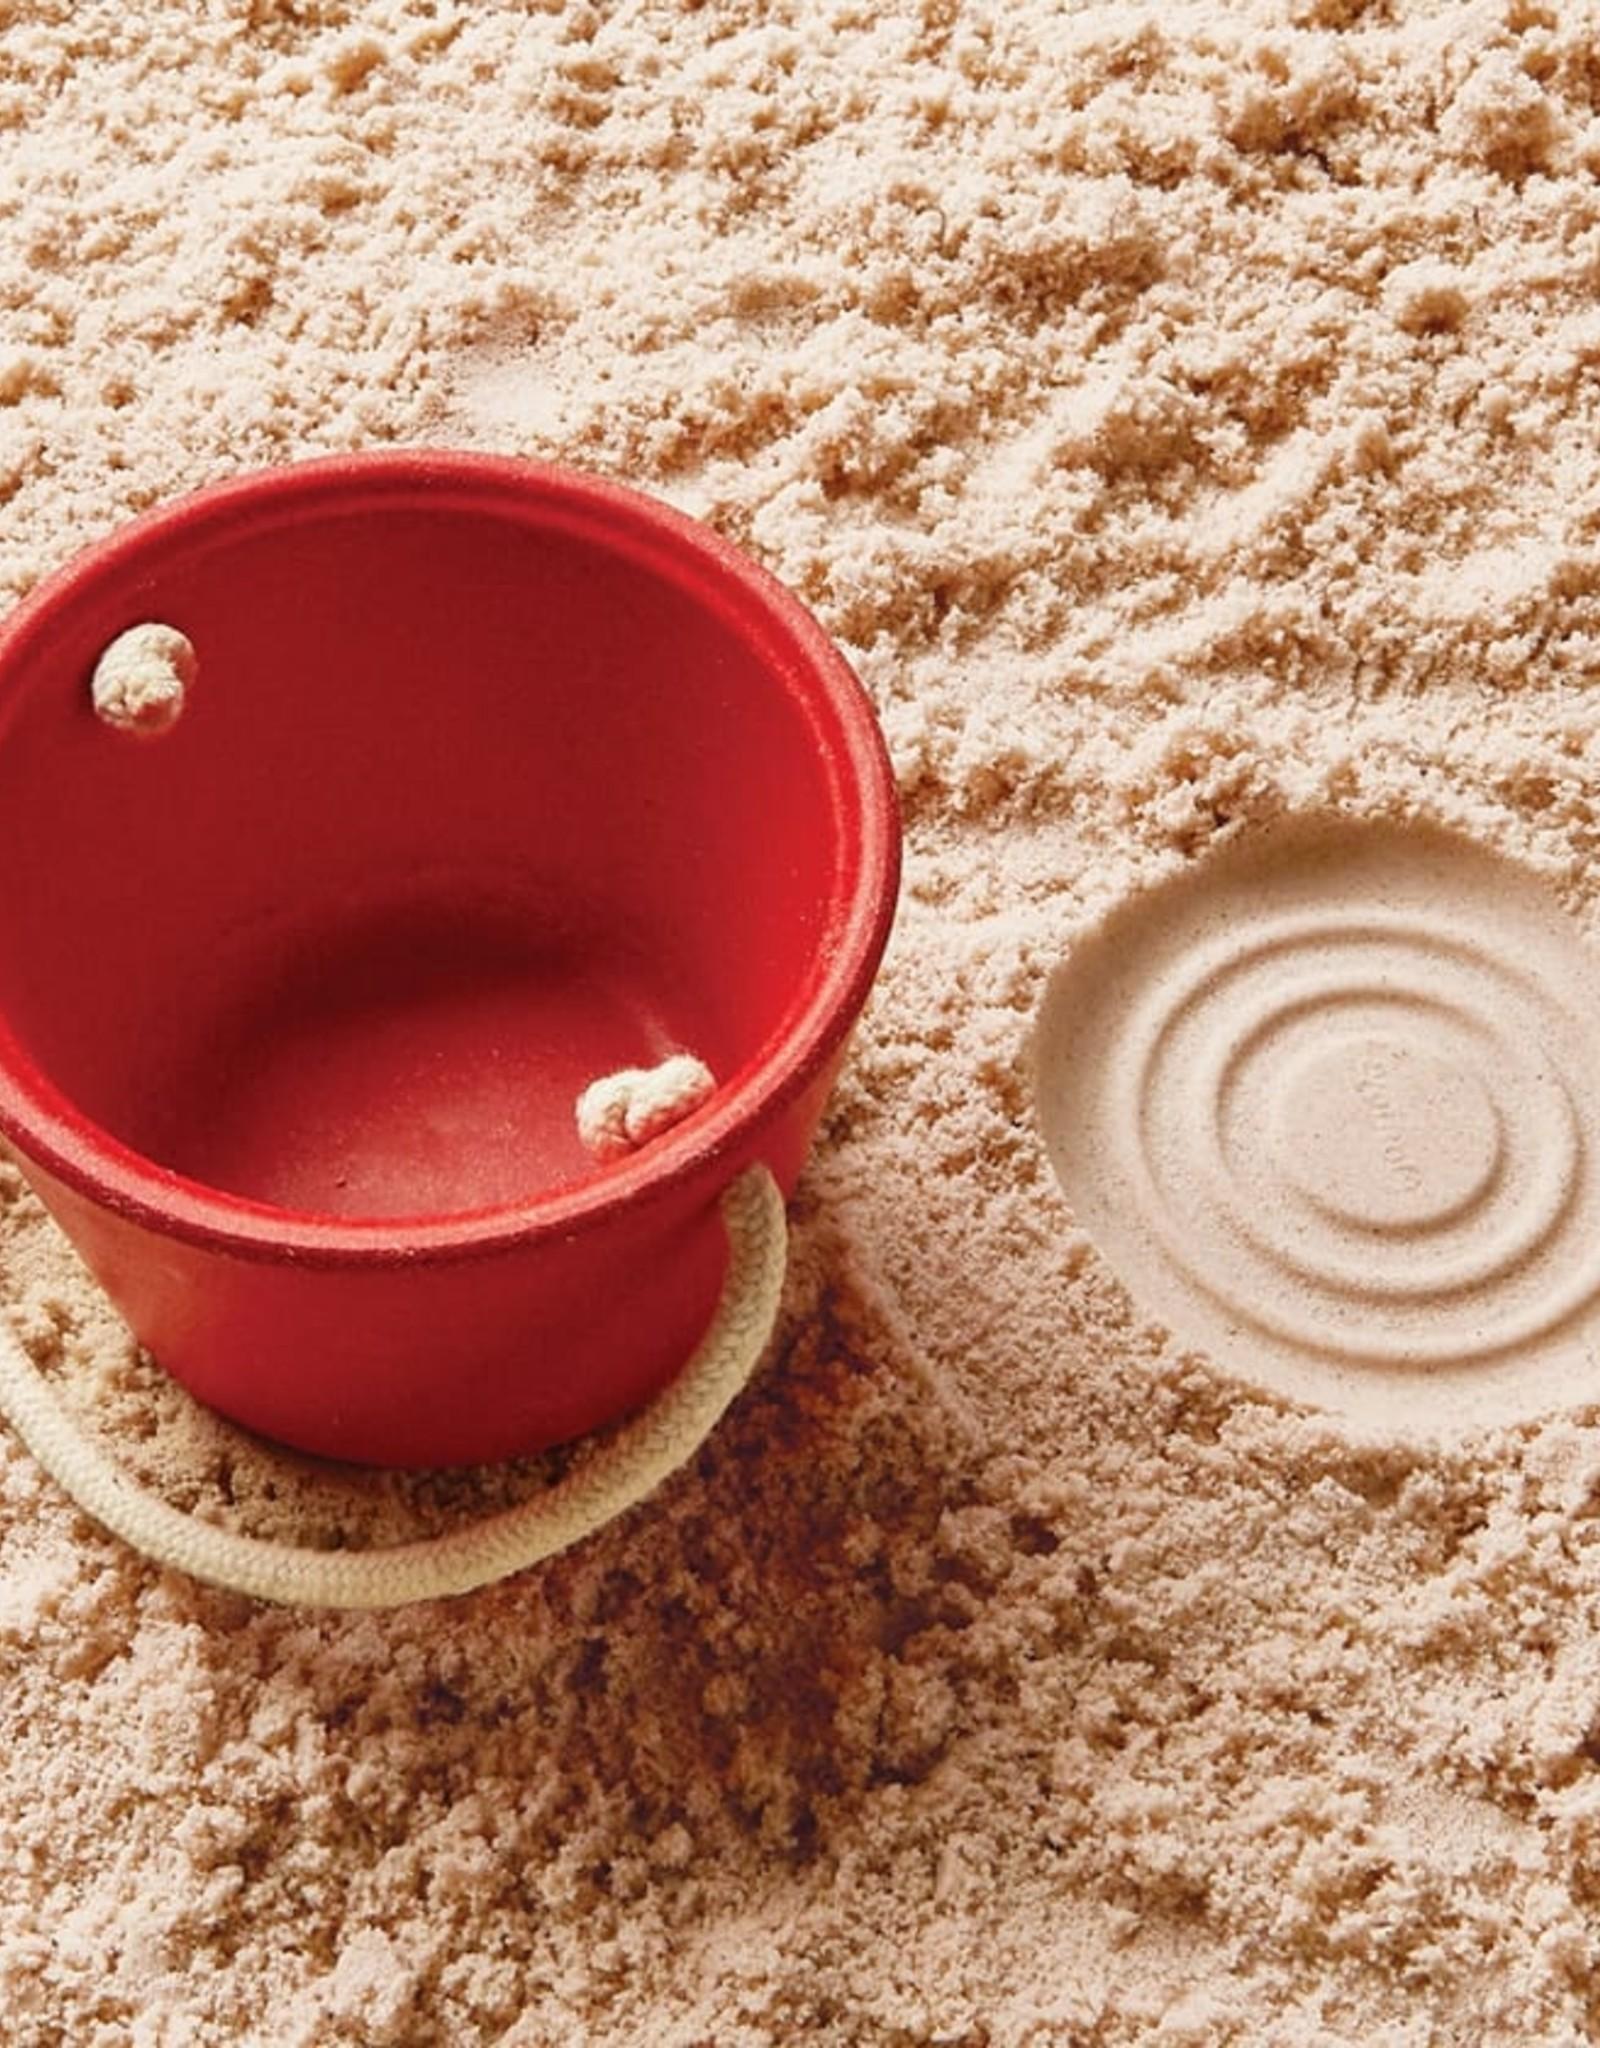 Plan Toys Sand Play Set